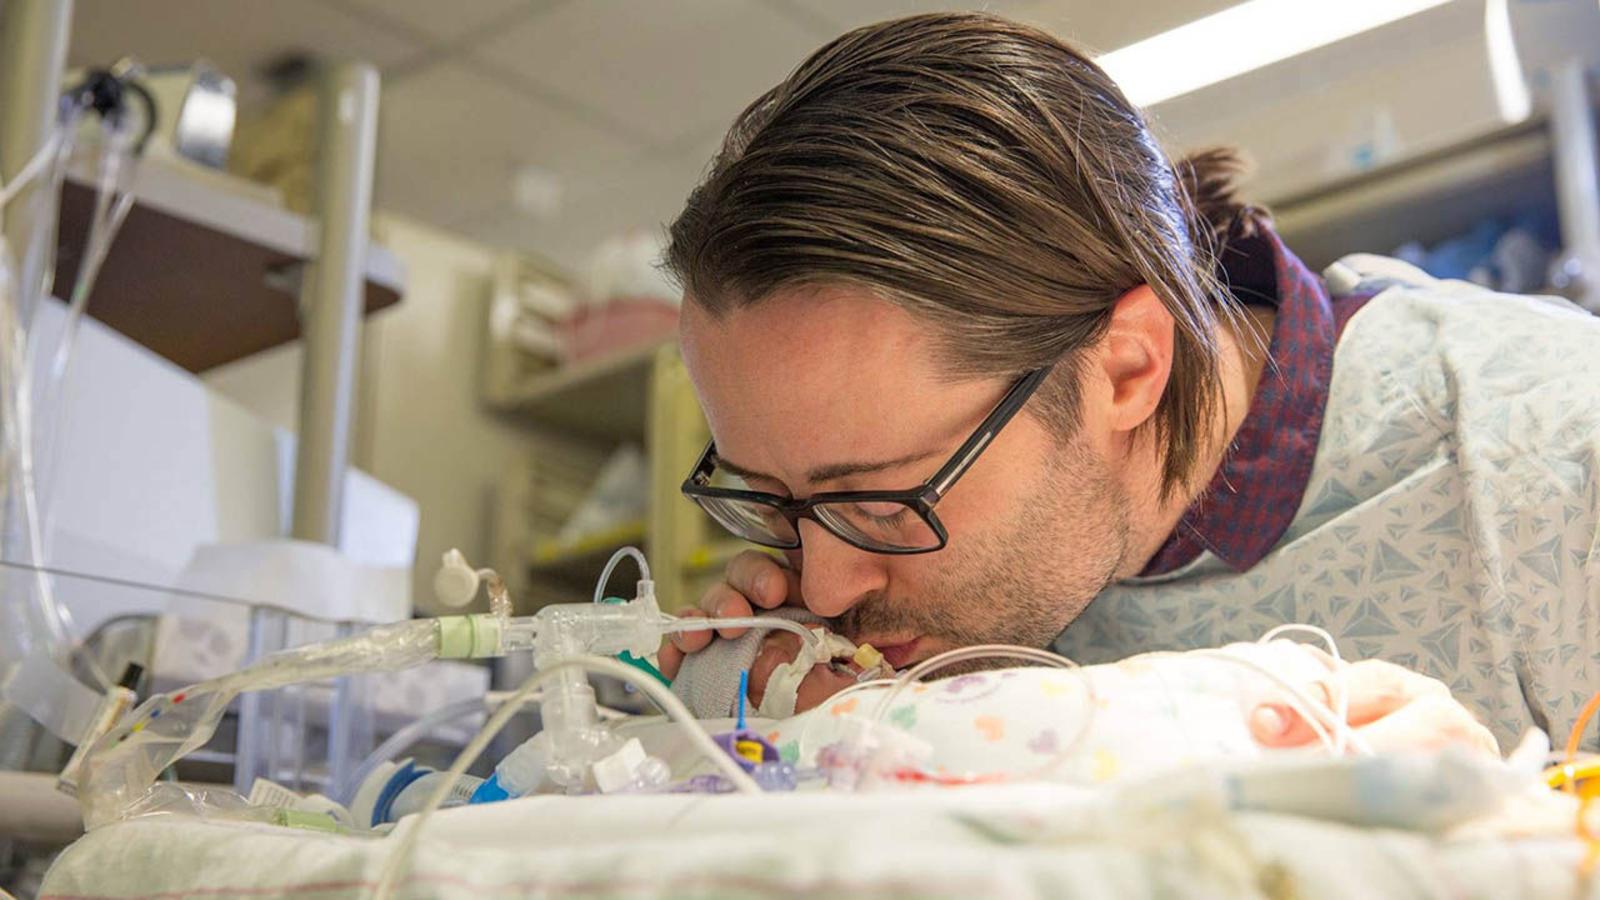 newborn sons emergency video - HD1600×900